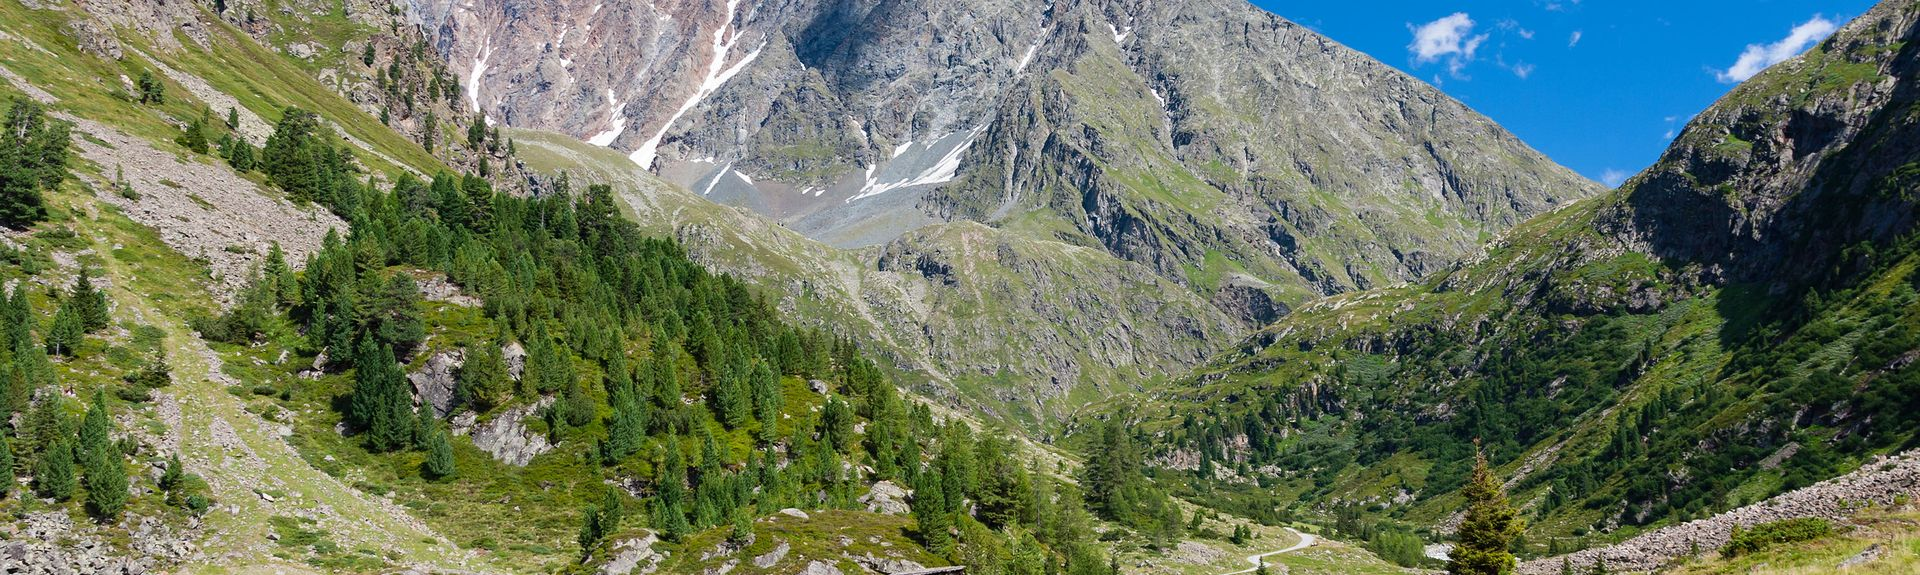 Ötztal, Längenfeld, Tyrolen, Österrike